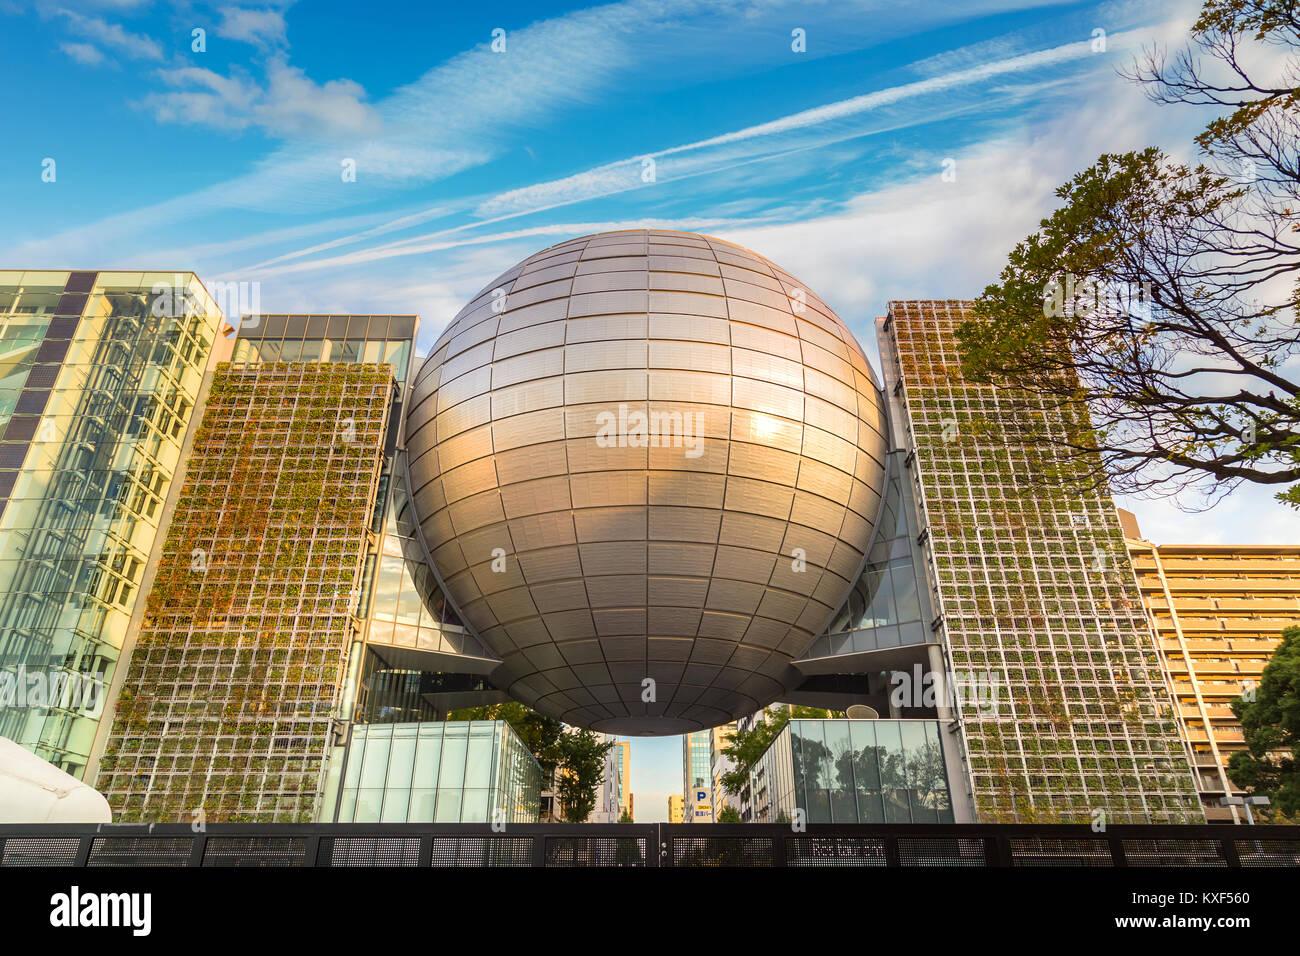 NAGOYA, JAPAN - NOVEMBER 21, 2015: Nagoya City Science Museum houses the largest planetarium in the world, it portrays Stock Photo